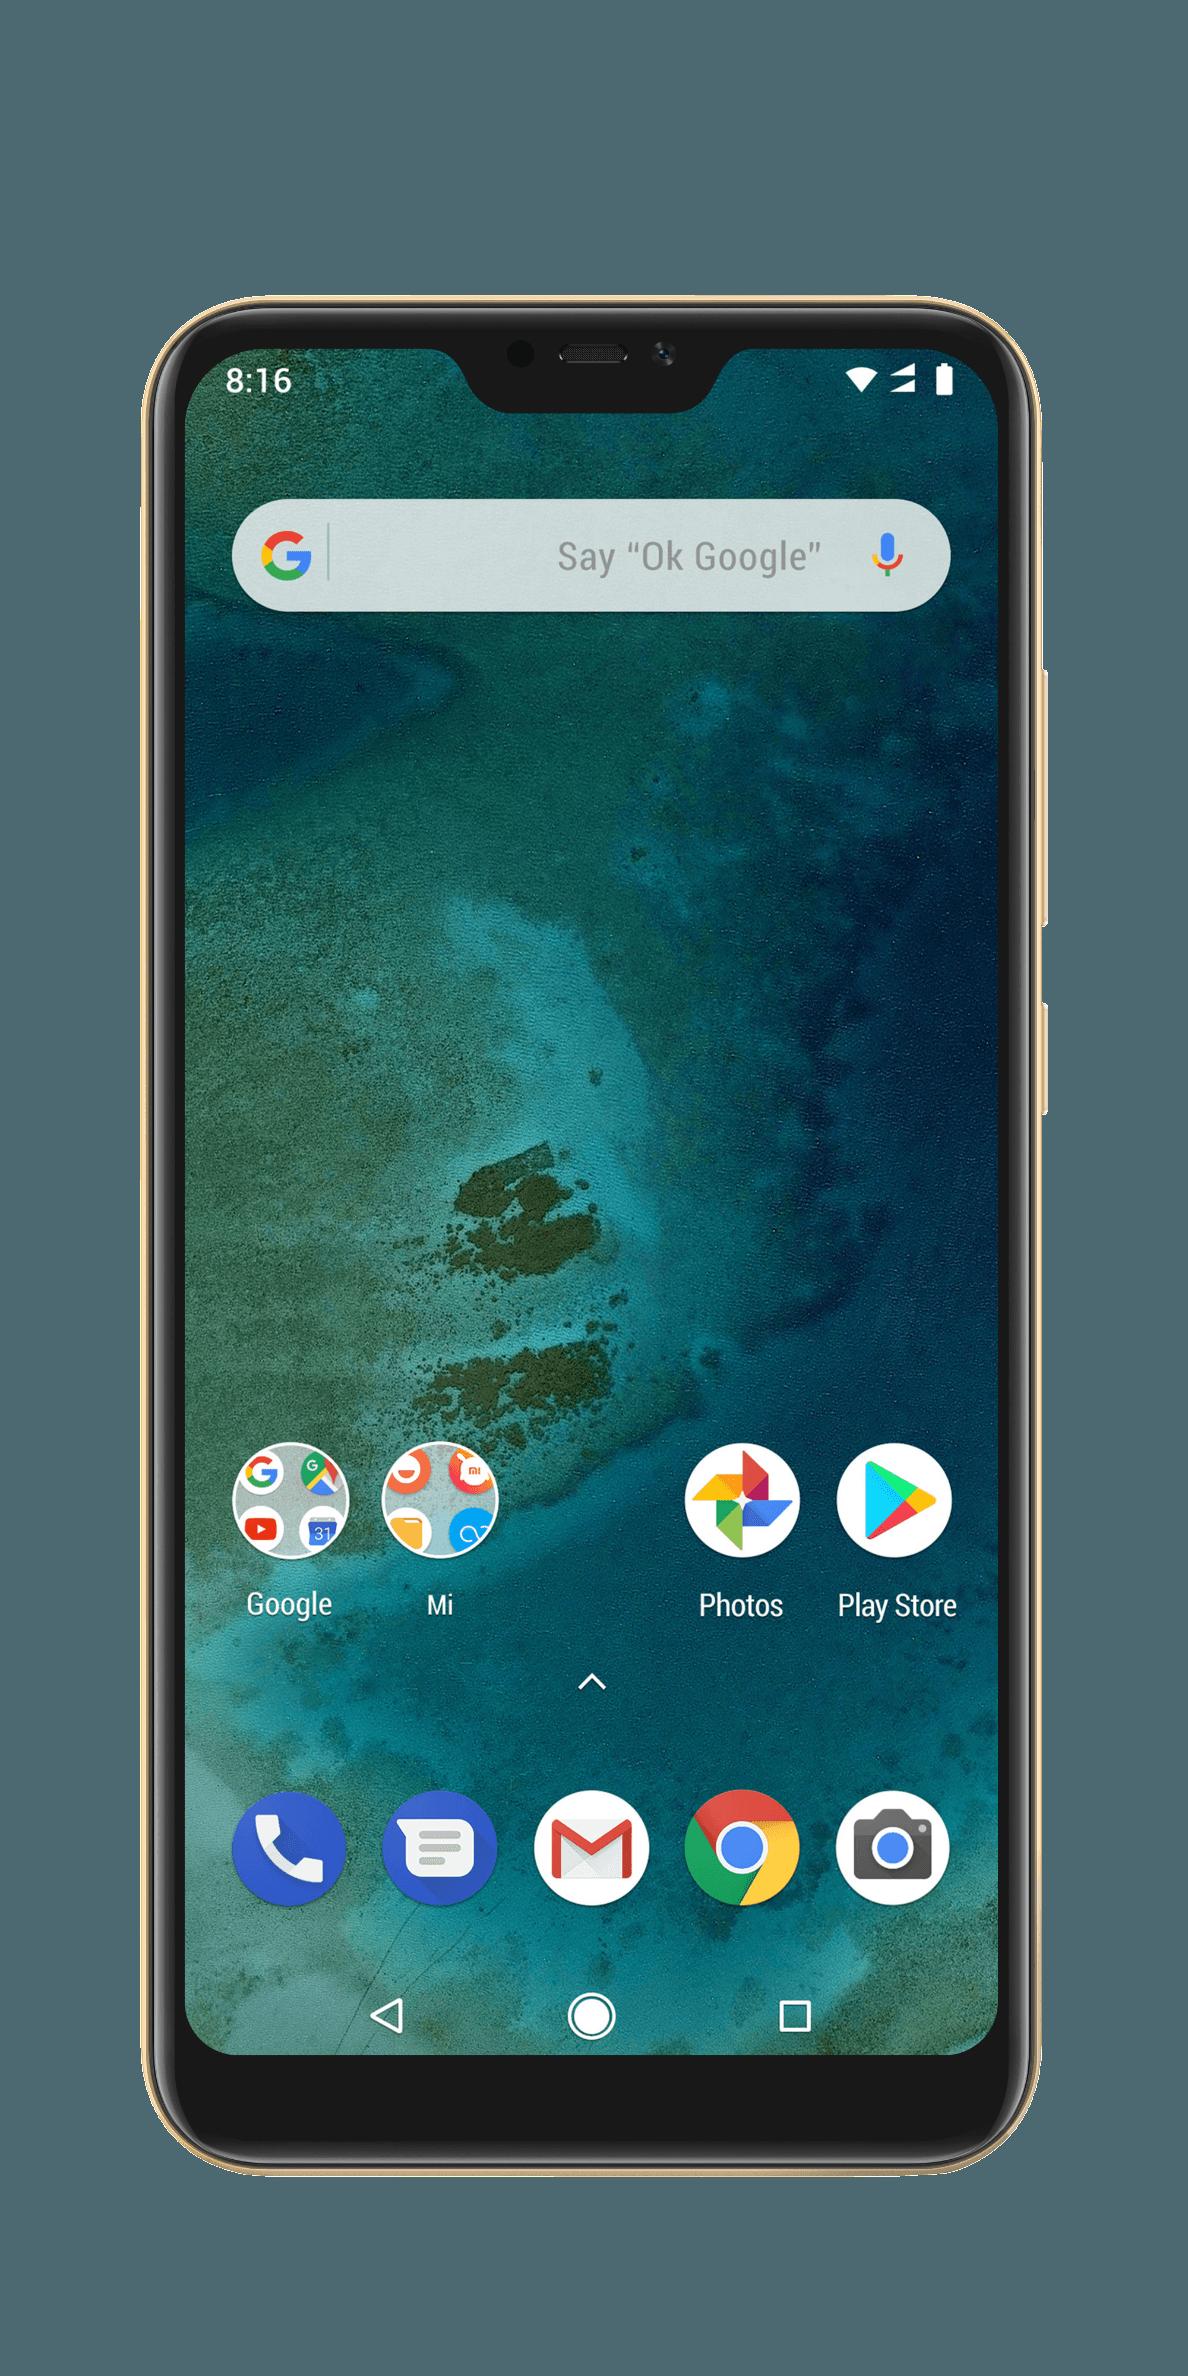 Xiaomi Mi A2 Lite Smartphone 64 Gb Gold 06941059608684 Xiaomi Mi A2 Lite Smartphone 64 Gb Gold Technik Notebook Laptop Smartphone Handy Tablet